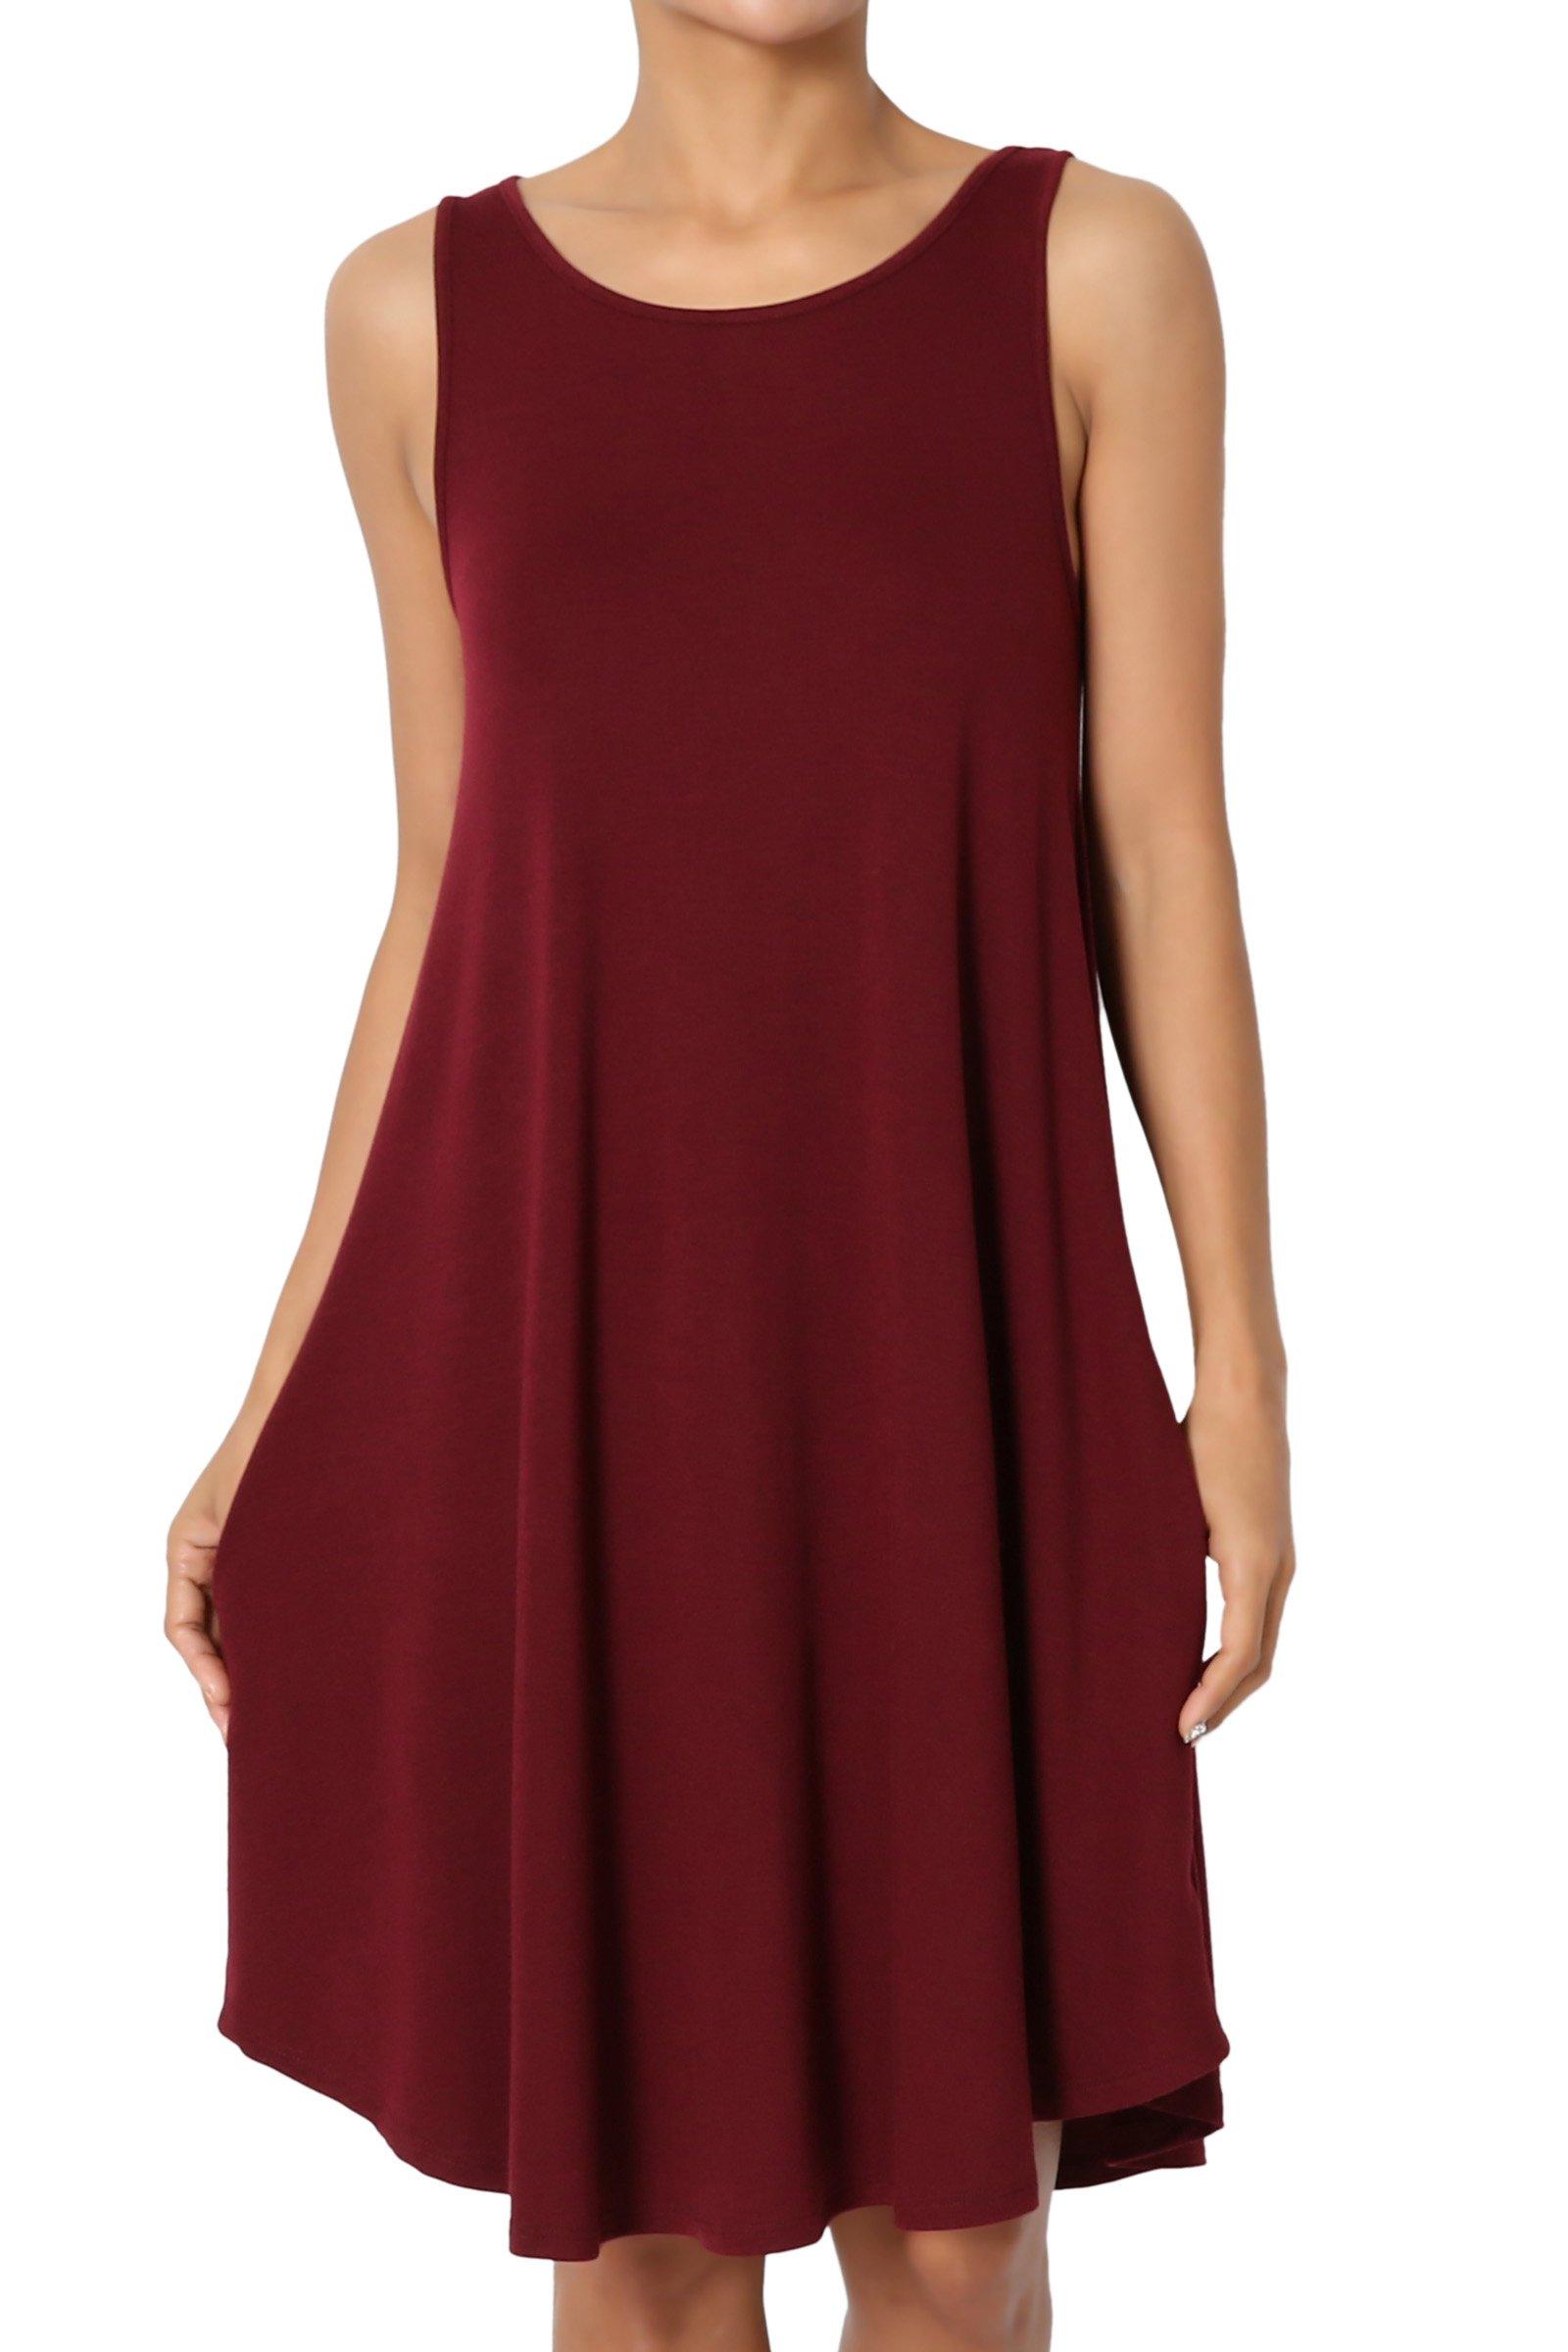 TheMogan Women's Sleeveless Trapeze Knit Pocket T-Shirt Dress Burgundy 2XL